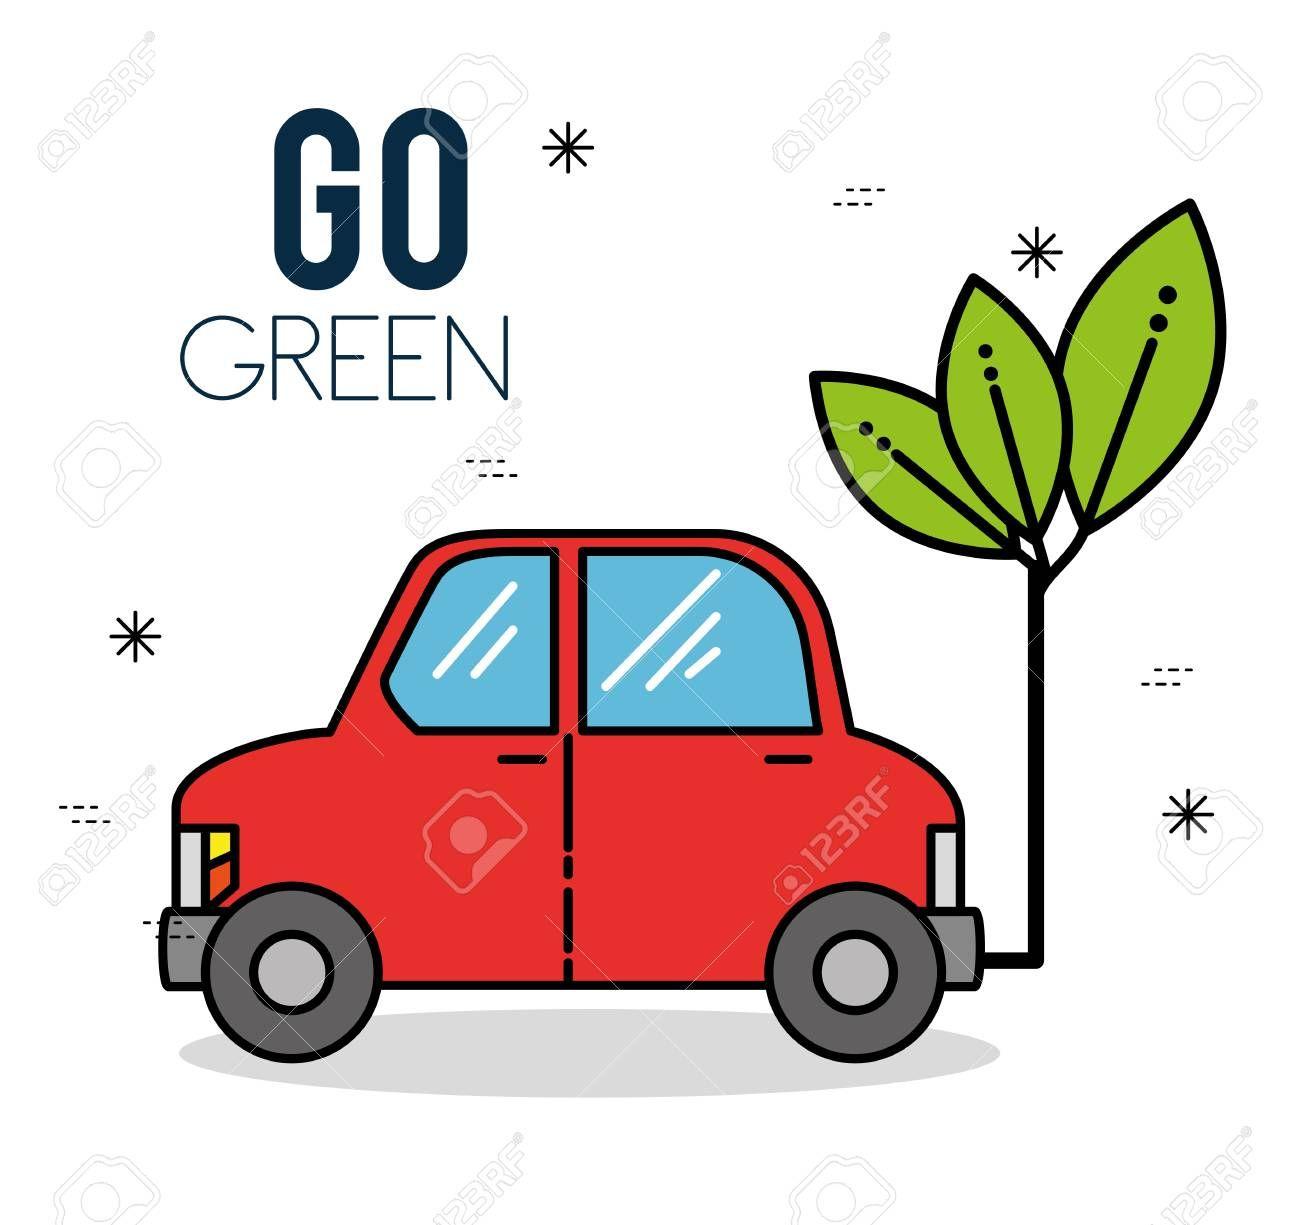 Eco Car Green Energy Ecology Environmentally Friendly Concept Vector Illustration Graphic Design Ad Energy Ecology Environm Graphisme Voiture Ecologie